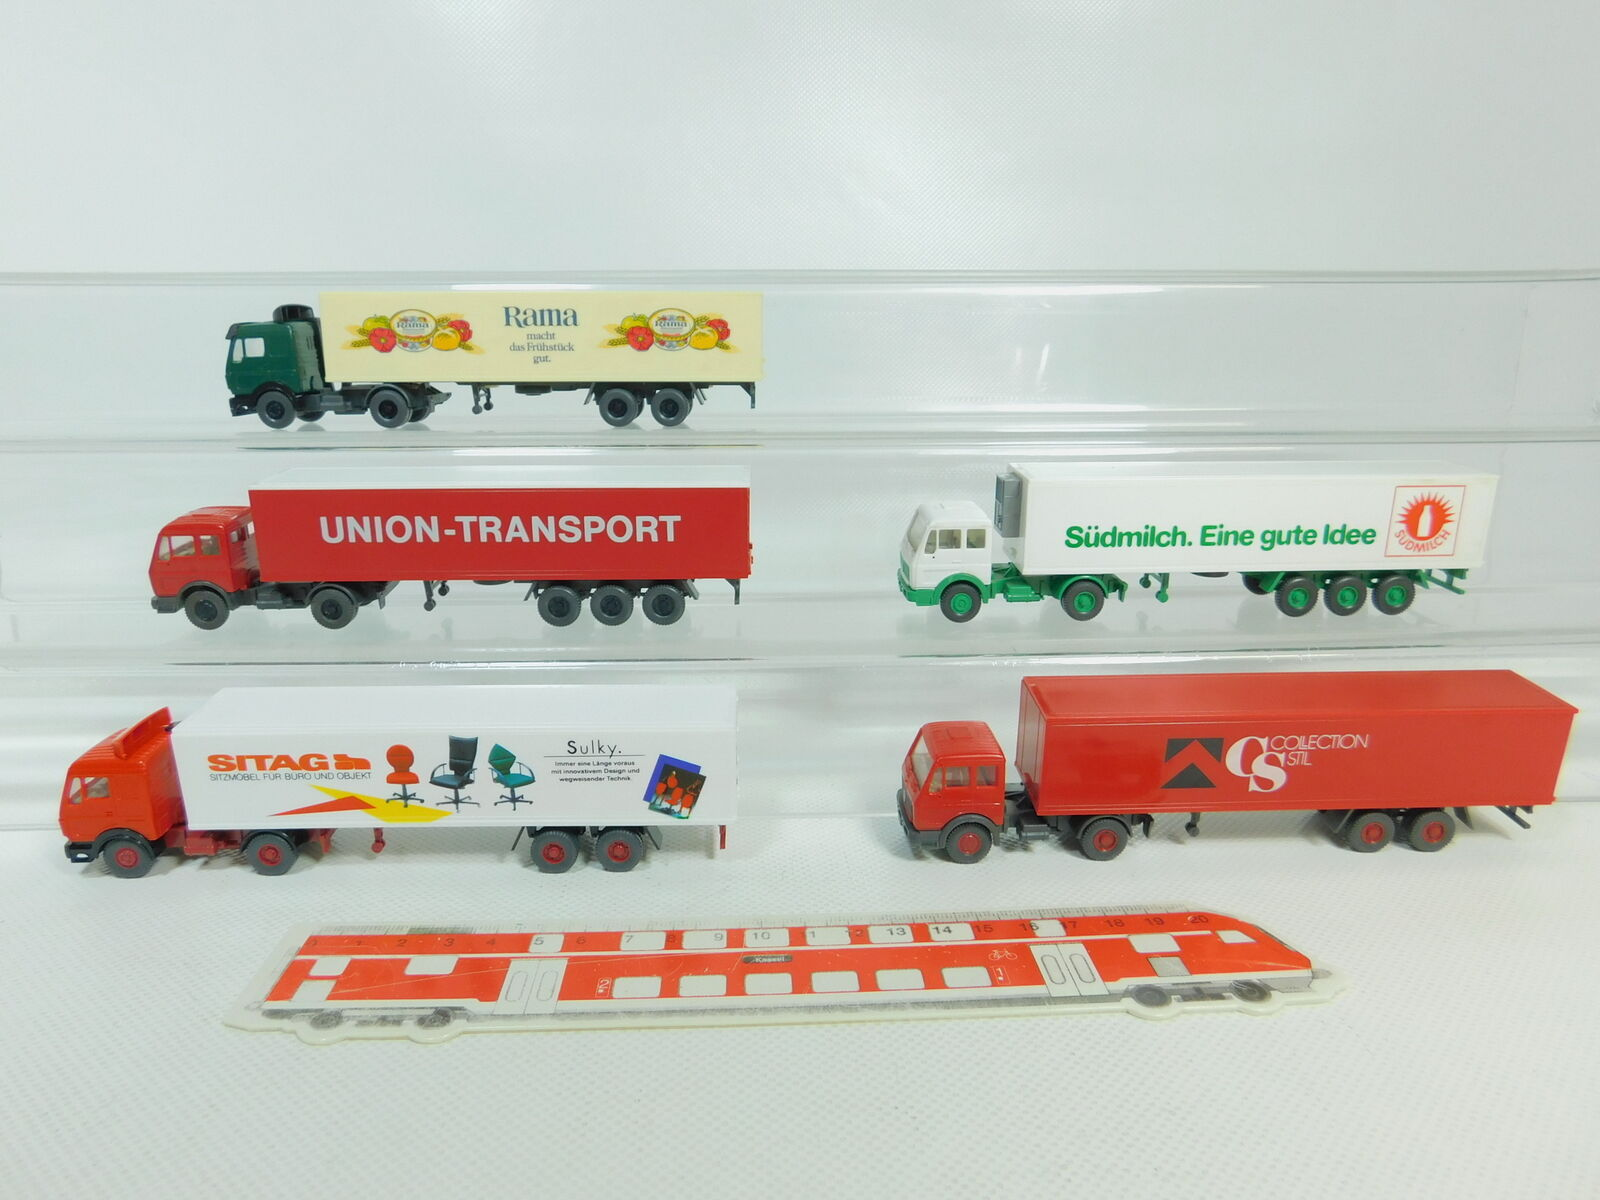 BO684-0, 5 x Wiking H0   1 87 Lorry MB  Sitag + Südmilch+Rama etc. , Very Good